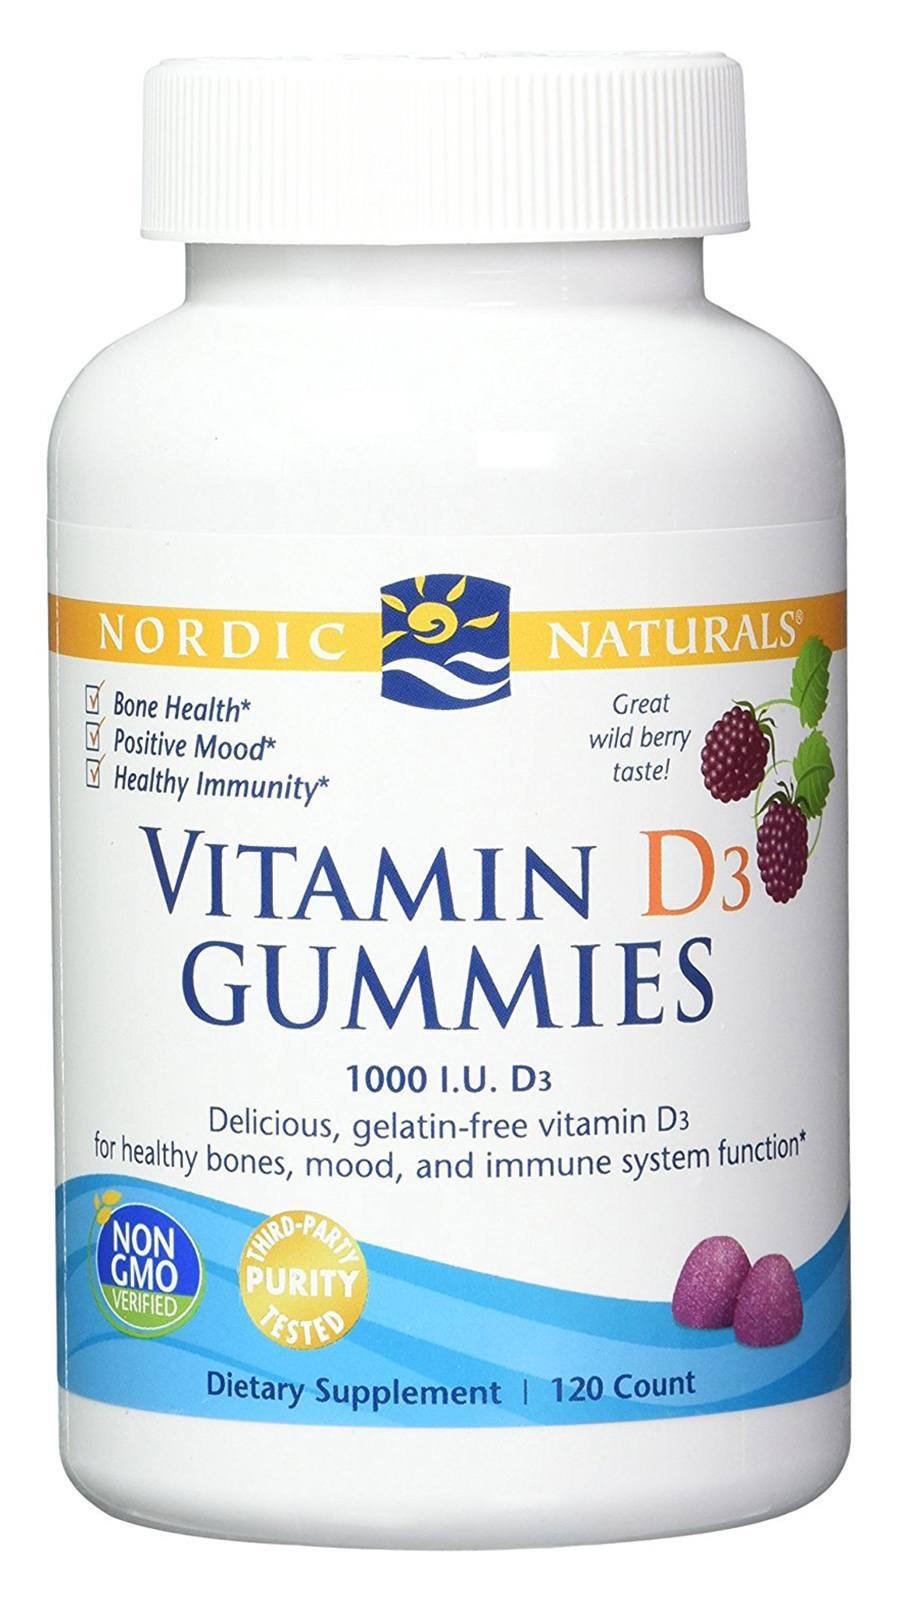 Vitamin d3 brands